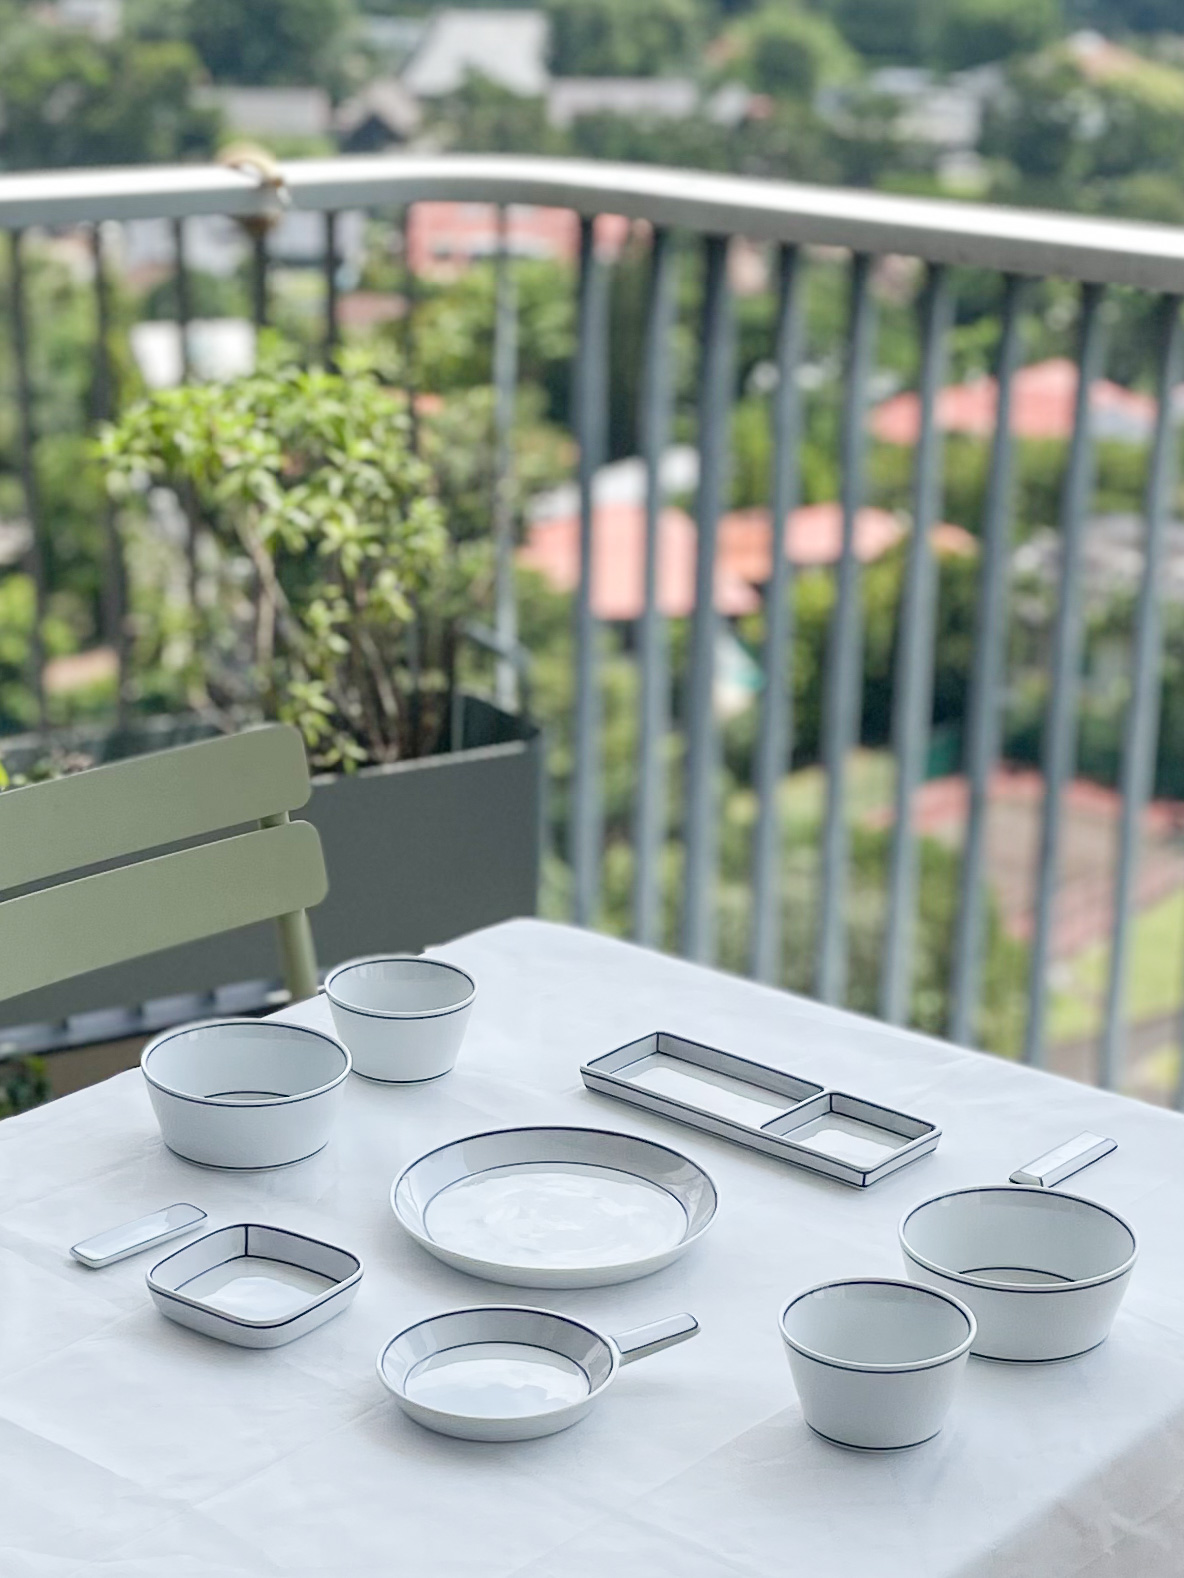 The Blueline Korean Table set for Twoby Kim Seok Binn